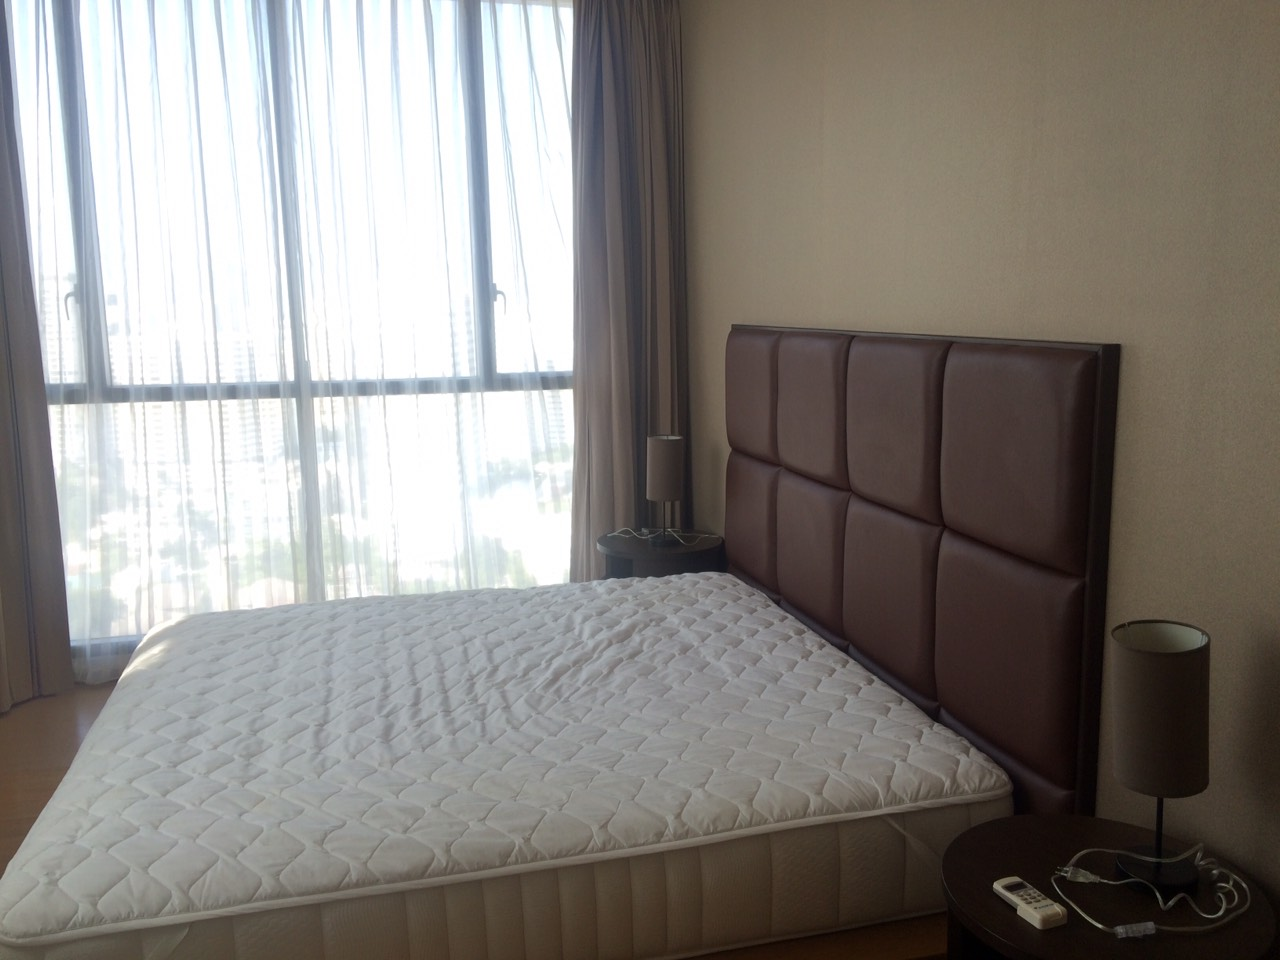 RE/MAX Properties Agency's SALE 1 Bedroom 61 Sq.m at Aequa 15